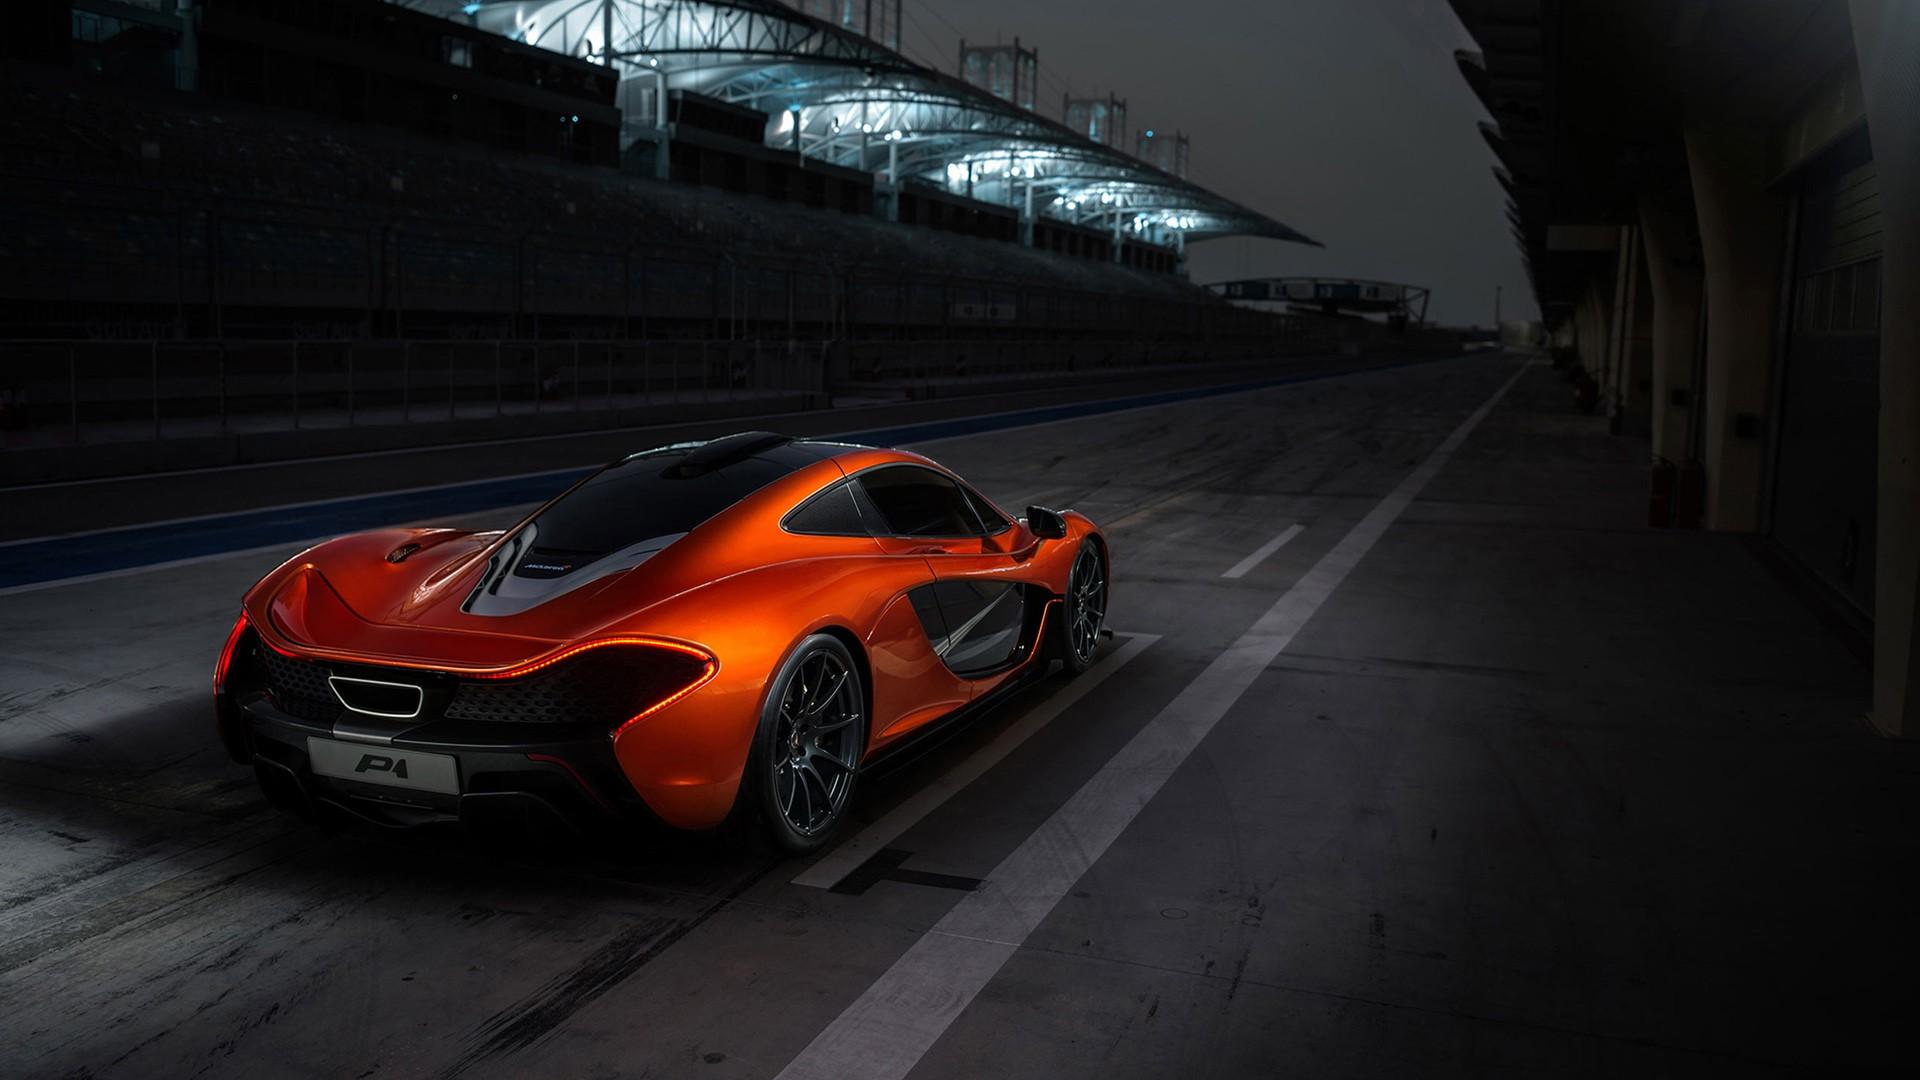 McLaren P1 2013 2 Wallpaper | HD Car Wallpapers | ID #3303